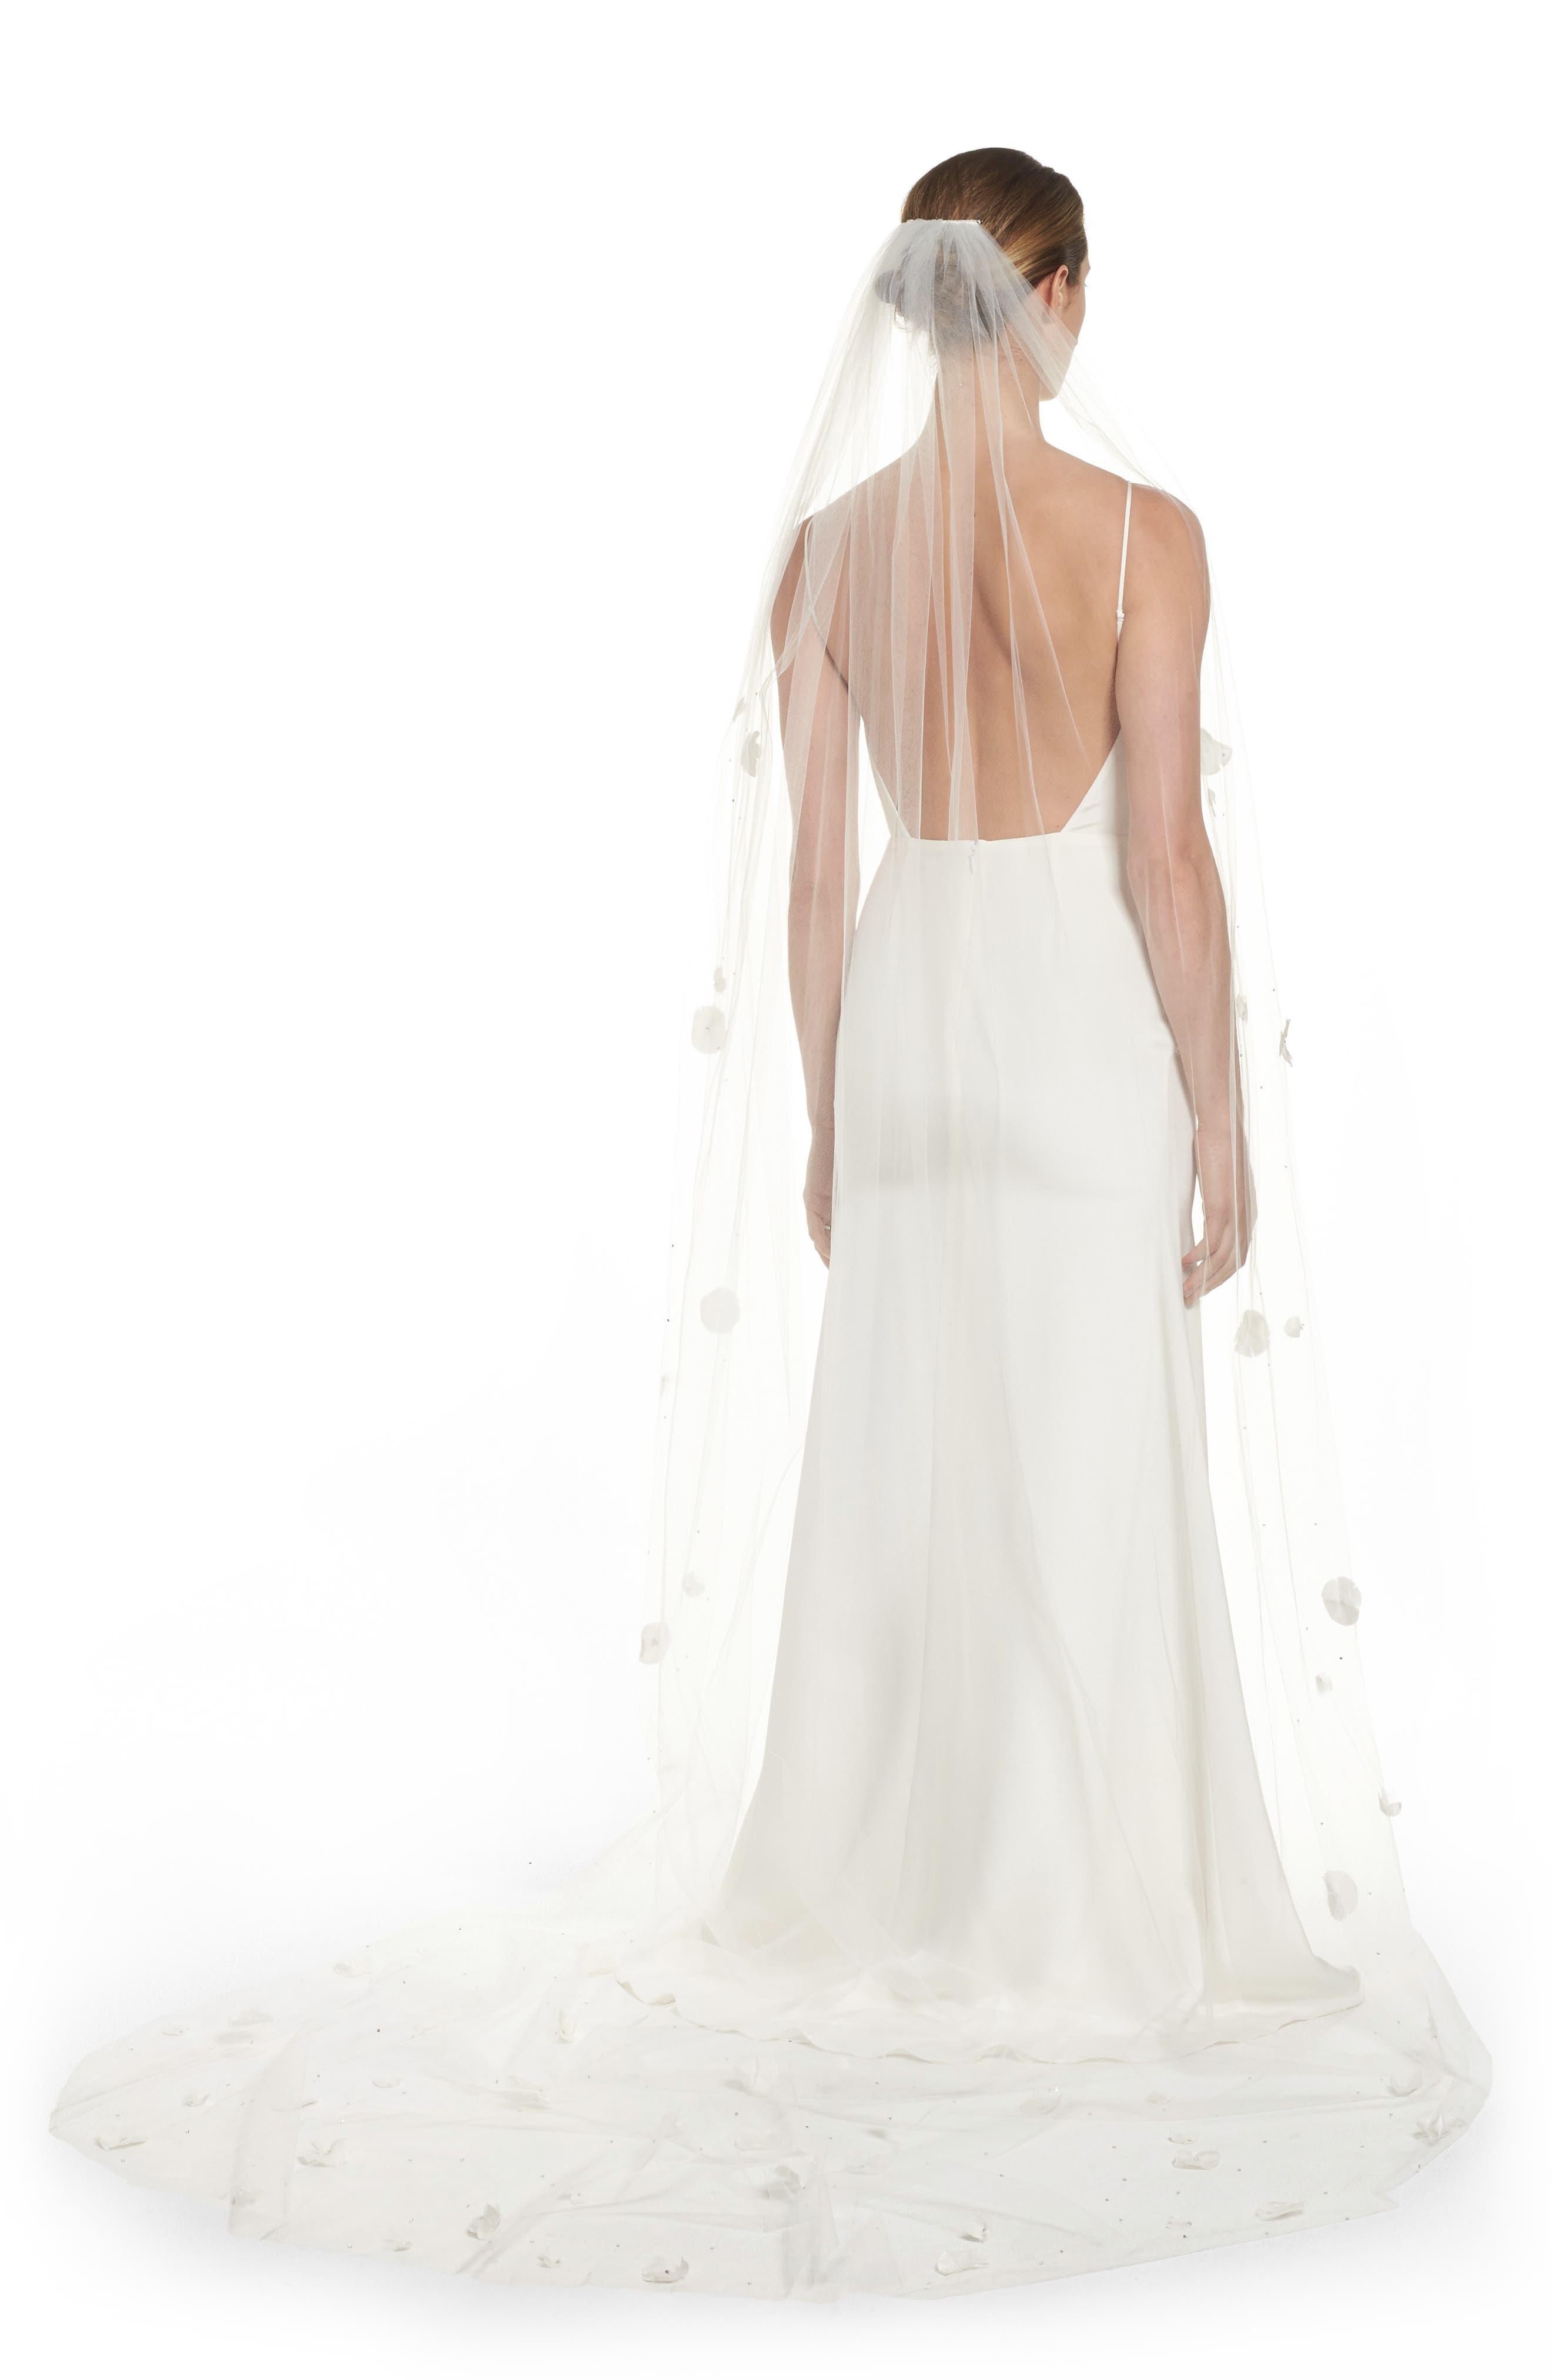 Fleet Embellished Bridal Veil,                             Main thumbnail 1, color,                             LIGHT IVORY